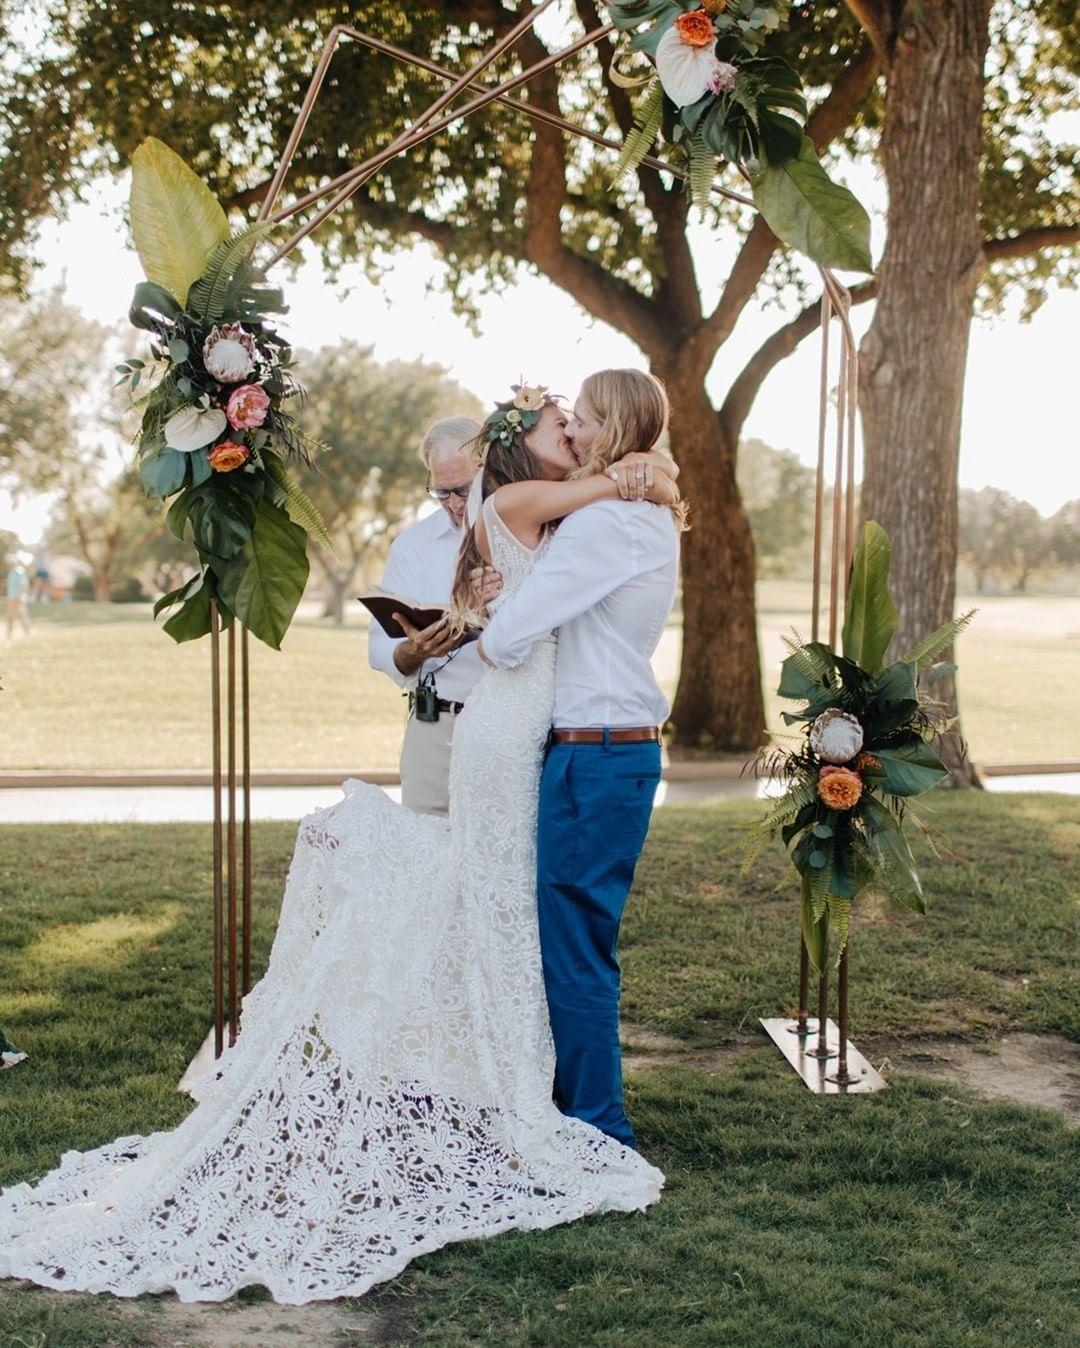 Tropics Meet Texas With This Summer Wedding In Dallas Tropical Wedding Flowers Event Rental Wedding